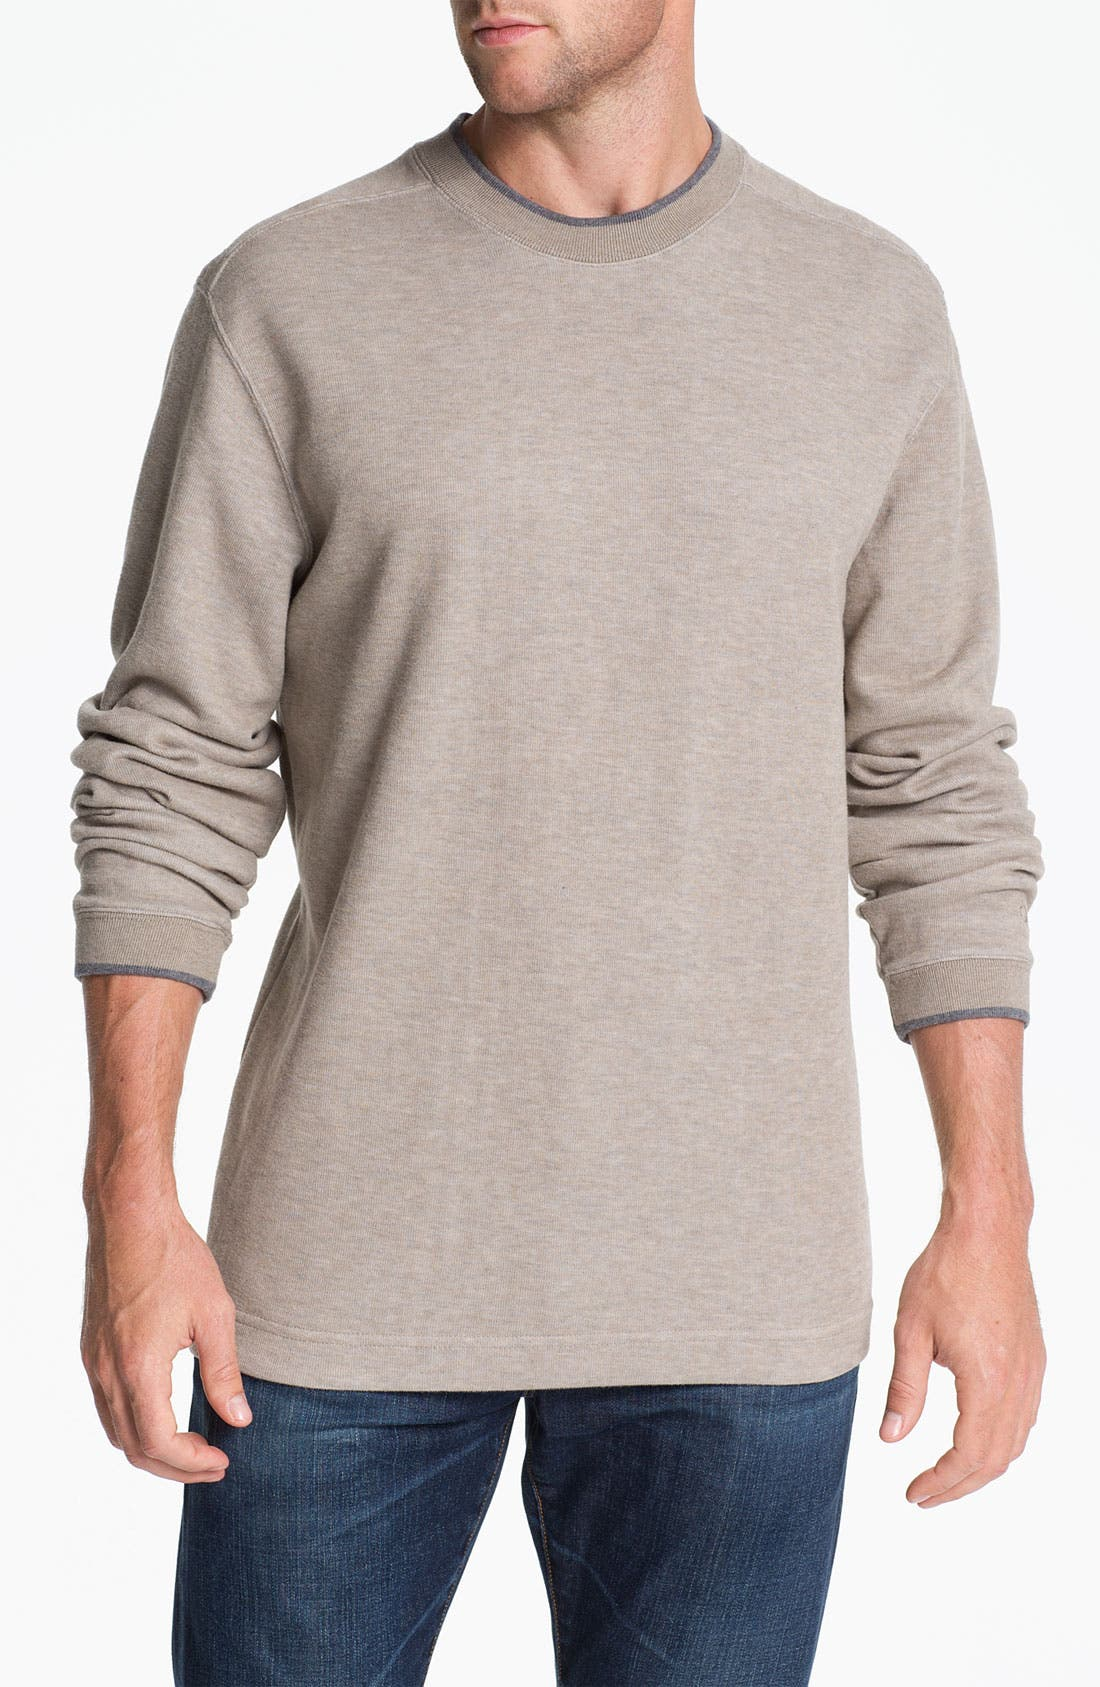 Main Image - Quiksilver 'Rock Lagoon' Crewneck T-Shirt